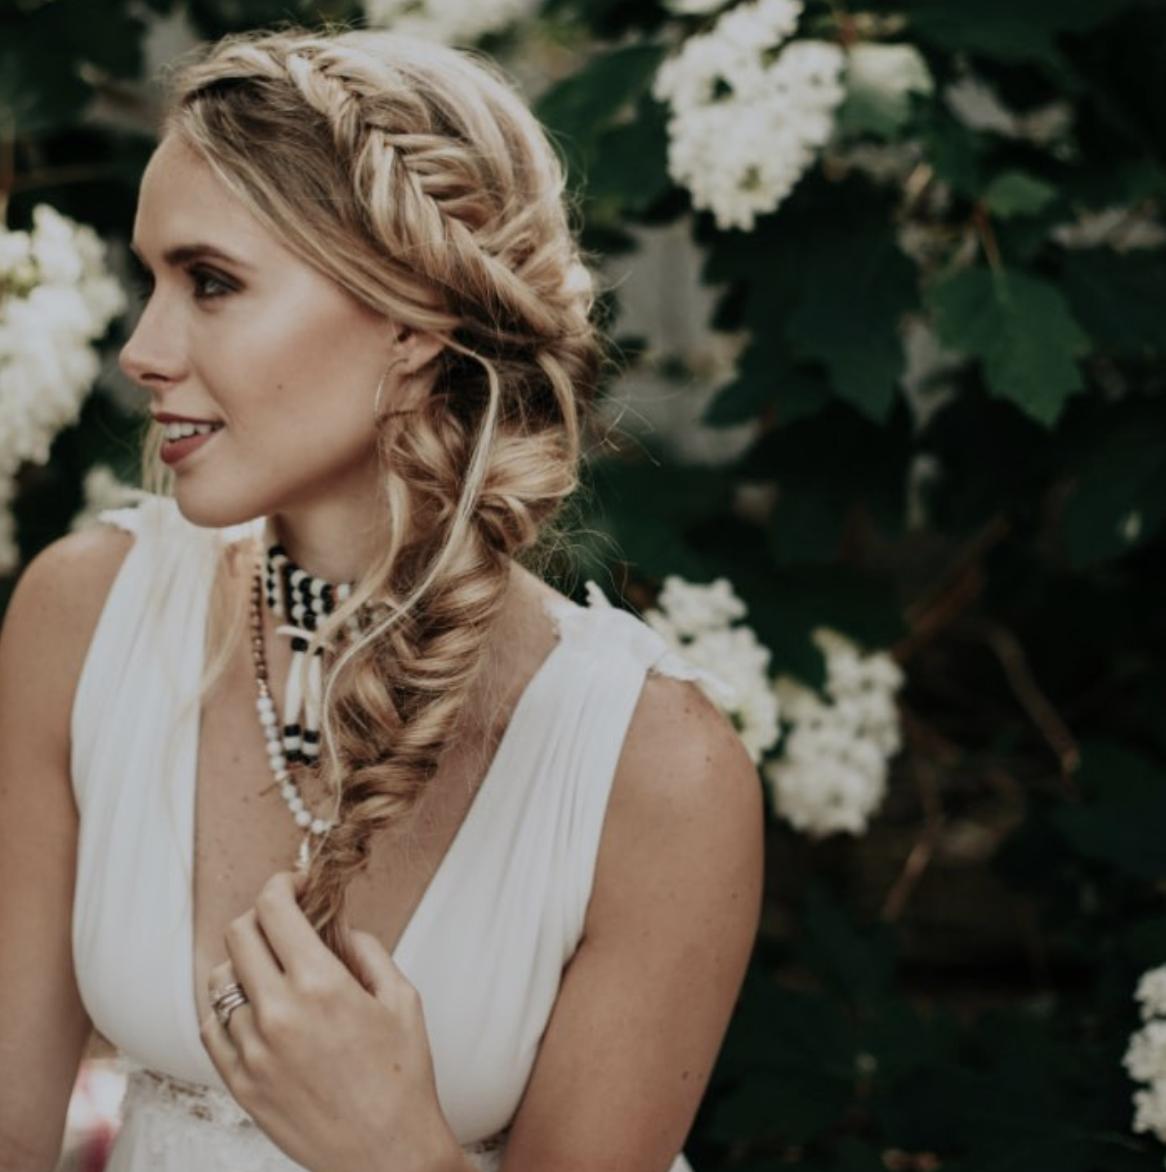 big beautiful bridal braid hair ideas | wed hair | bridal